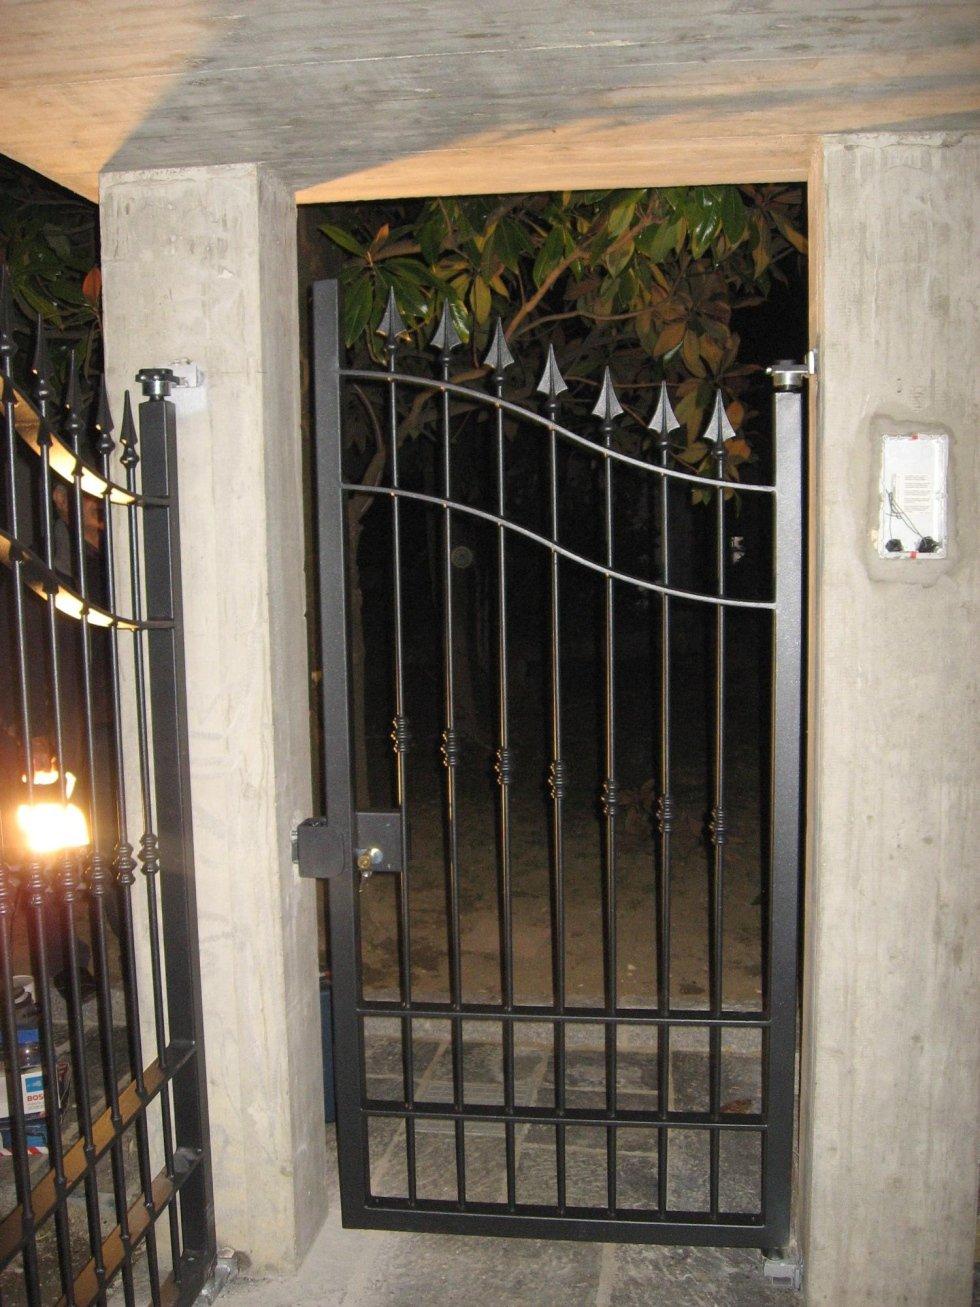 Ben noto Cancelli di ingresso | Besana in Brianza, MB | BP Il Fabbro YN19